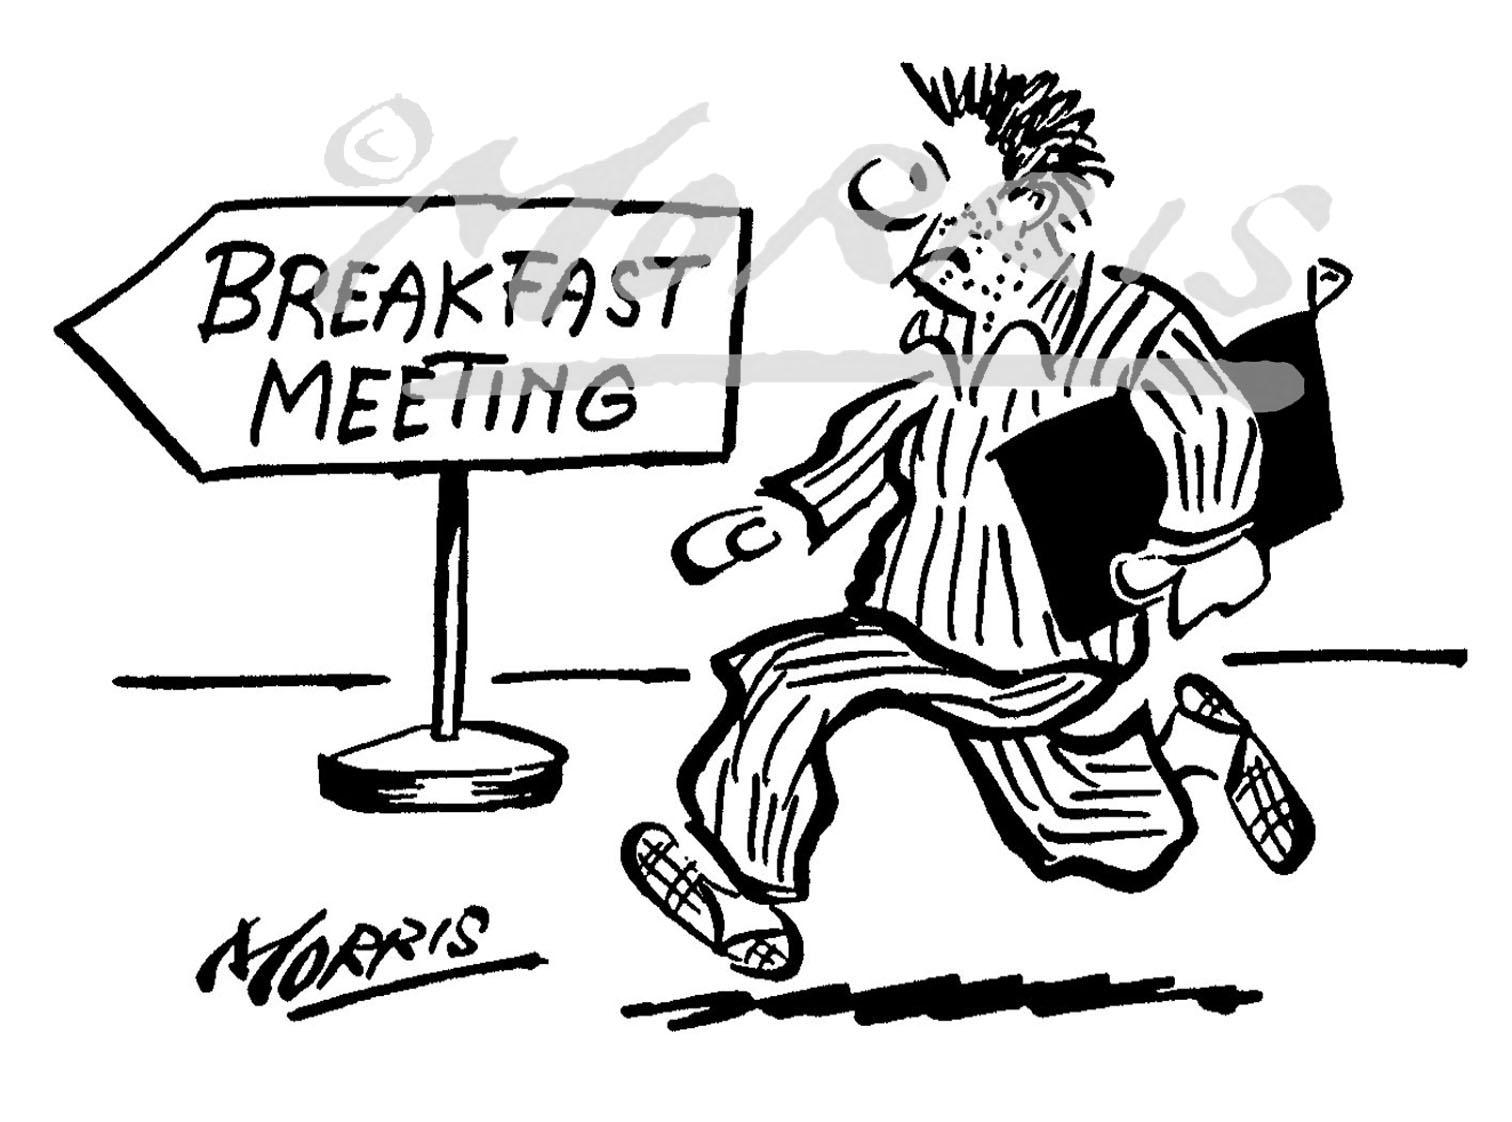 Breakfast meeting cartoon Ref: 1252bw